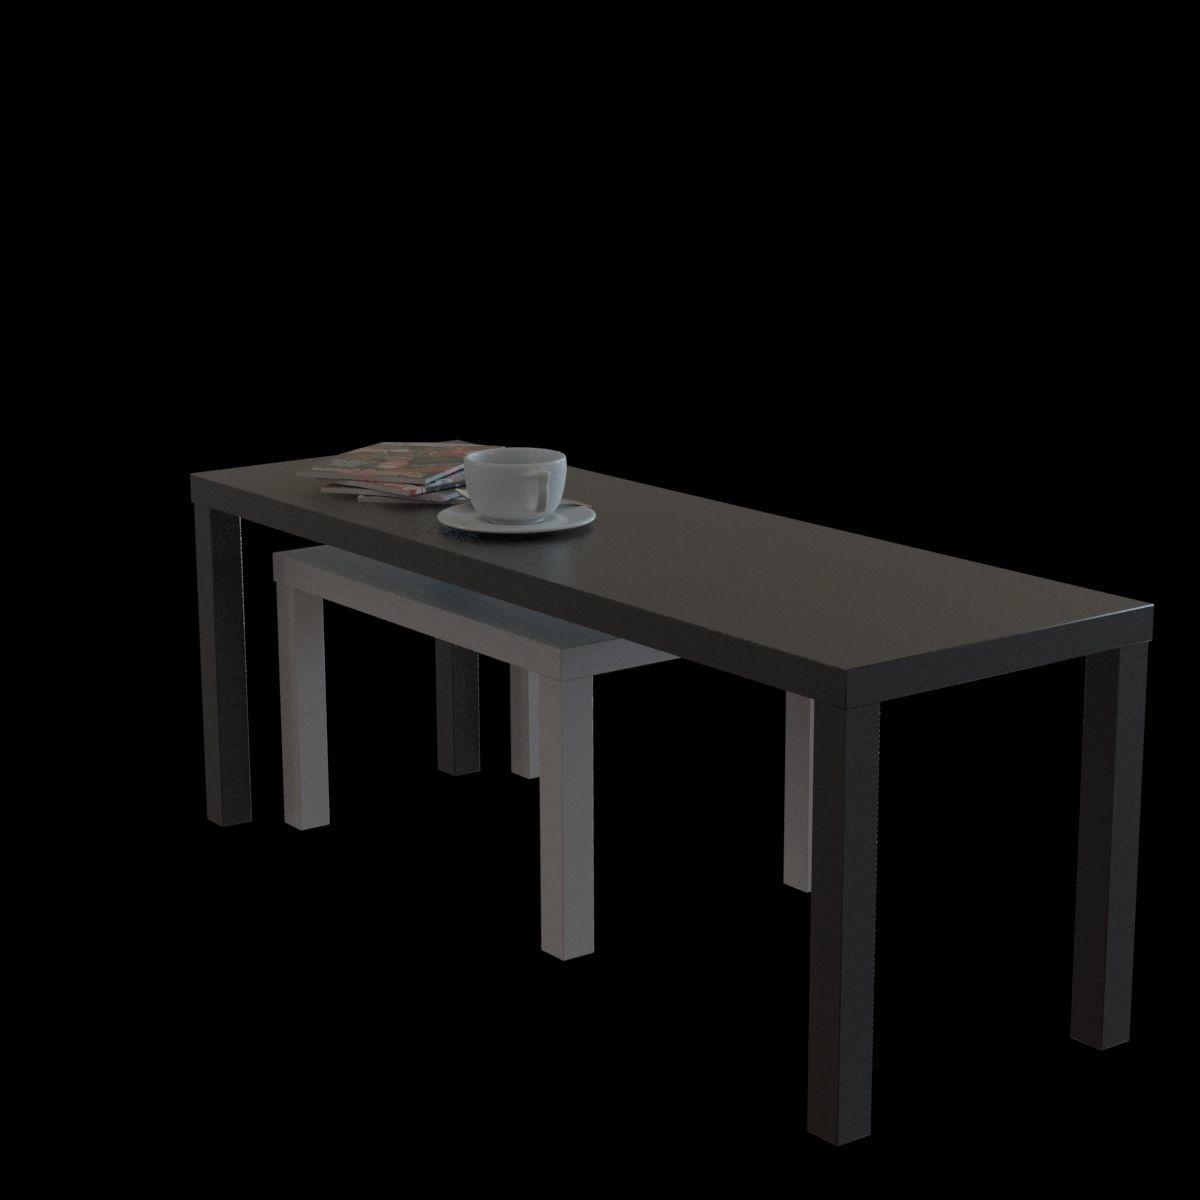 022ce72c9895 3D IKEA lack nesting table ikea